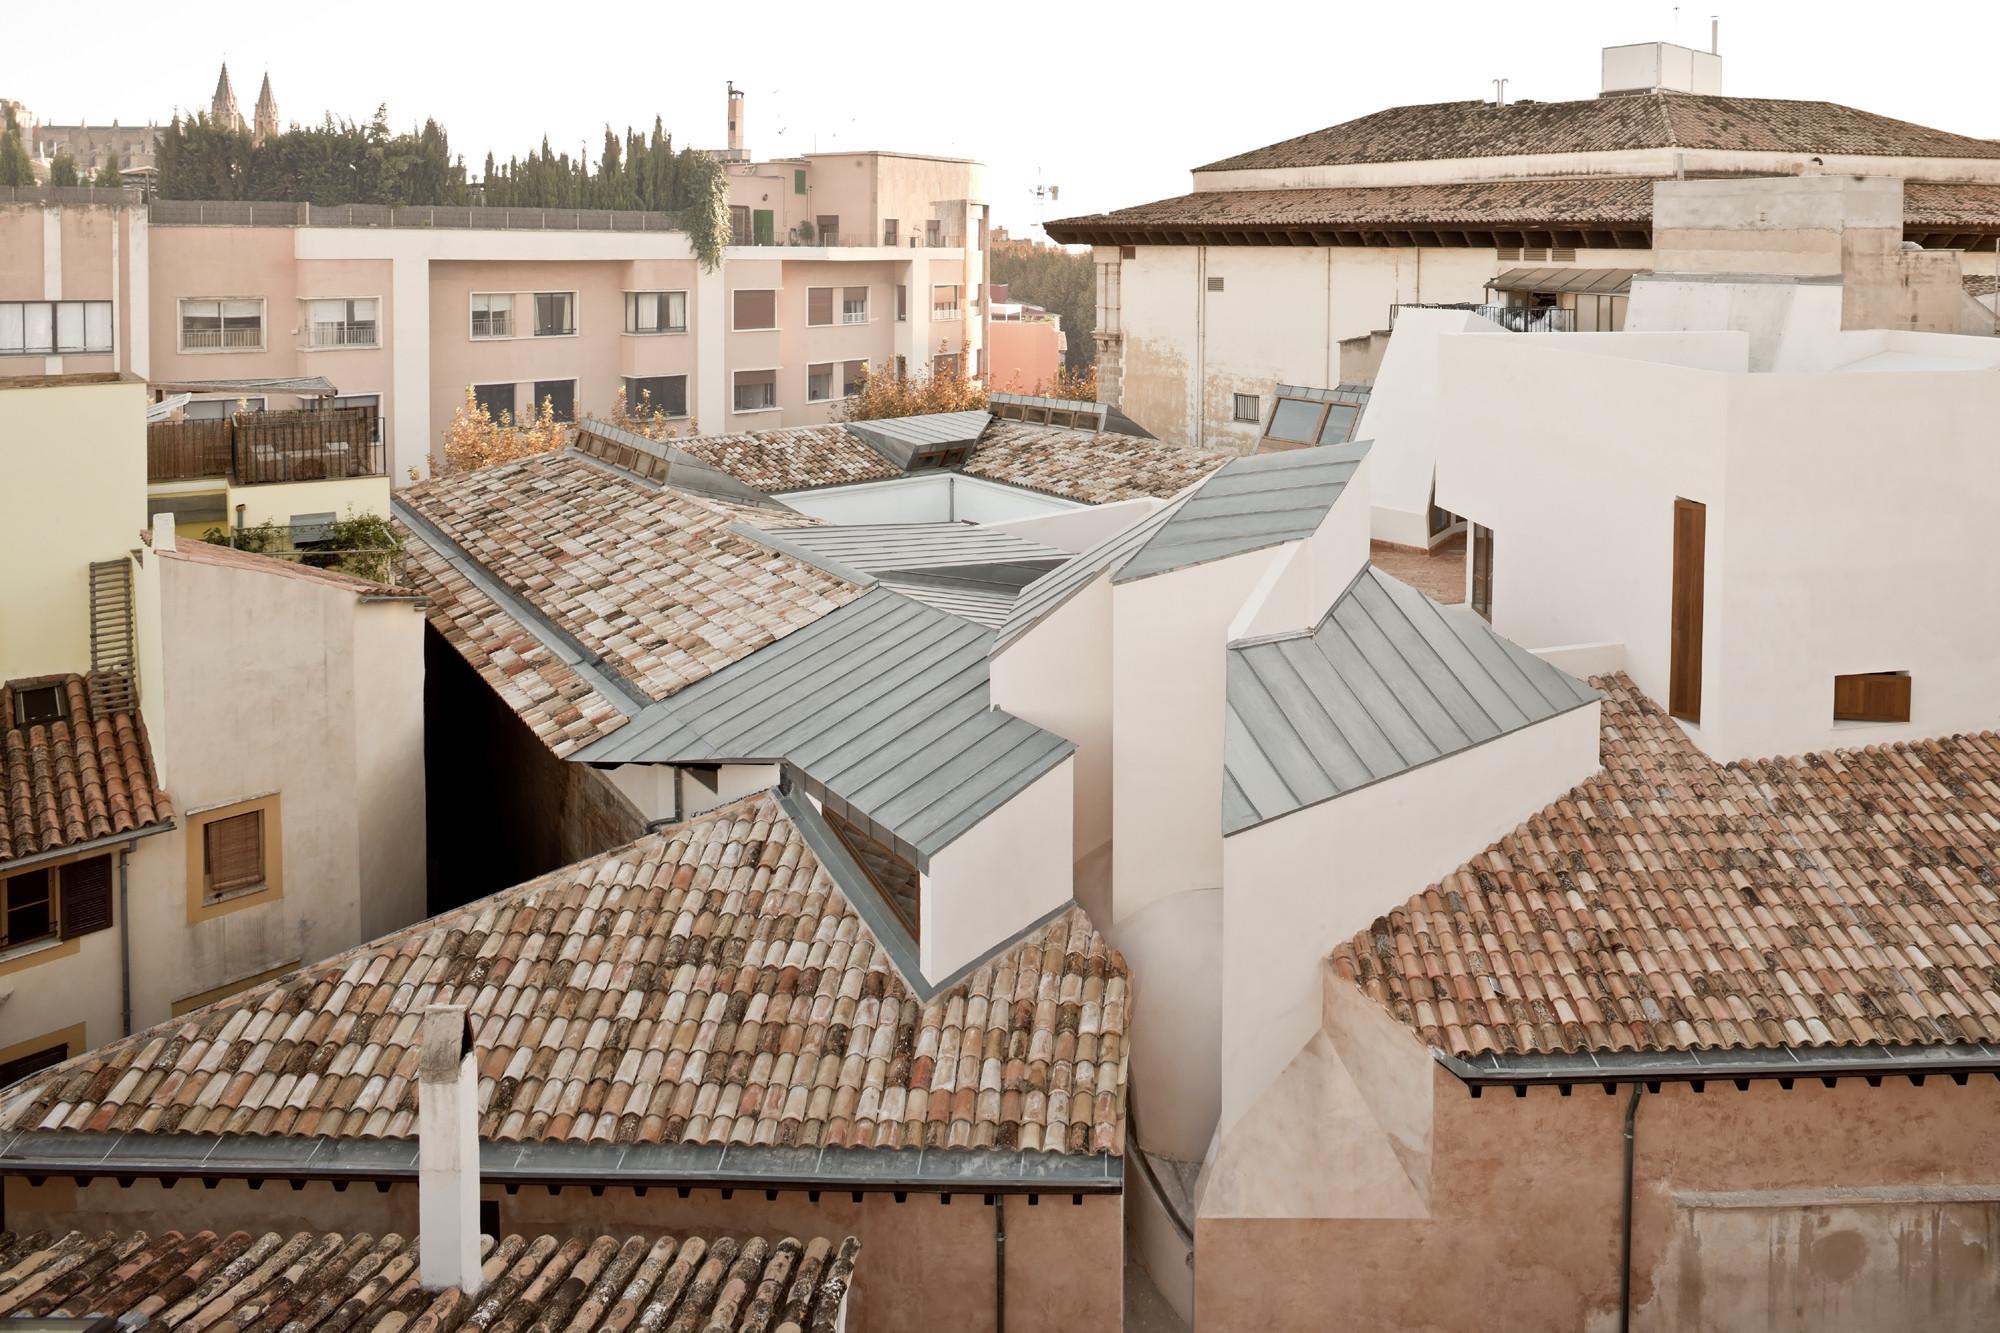 Centro Cultural Casal Balaguer / Flores & Prats + Duch-Pizá, Courtesy of Flores & Prats + Duch-Pizá